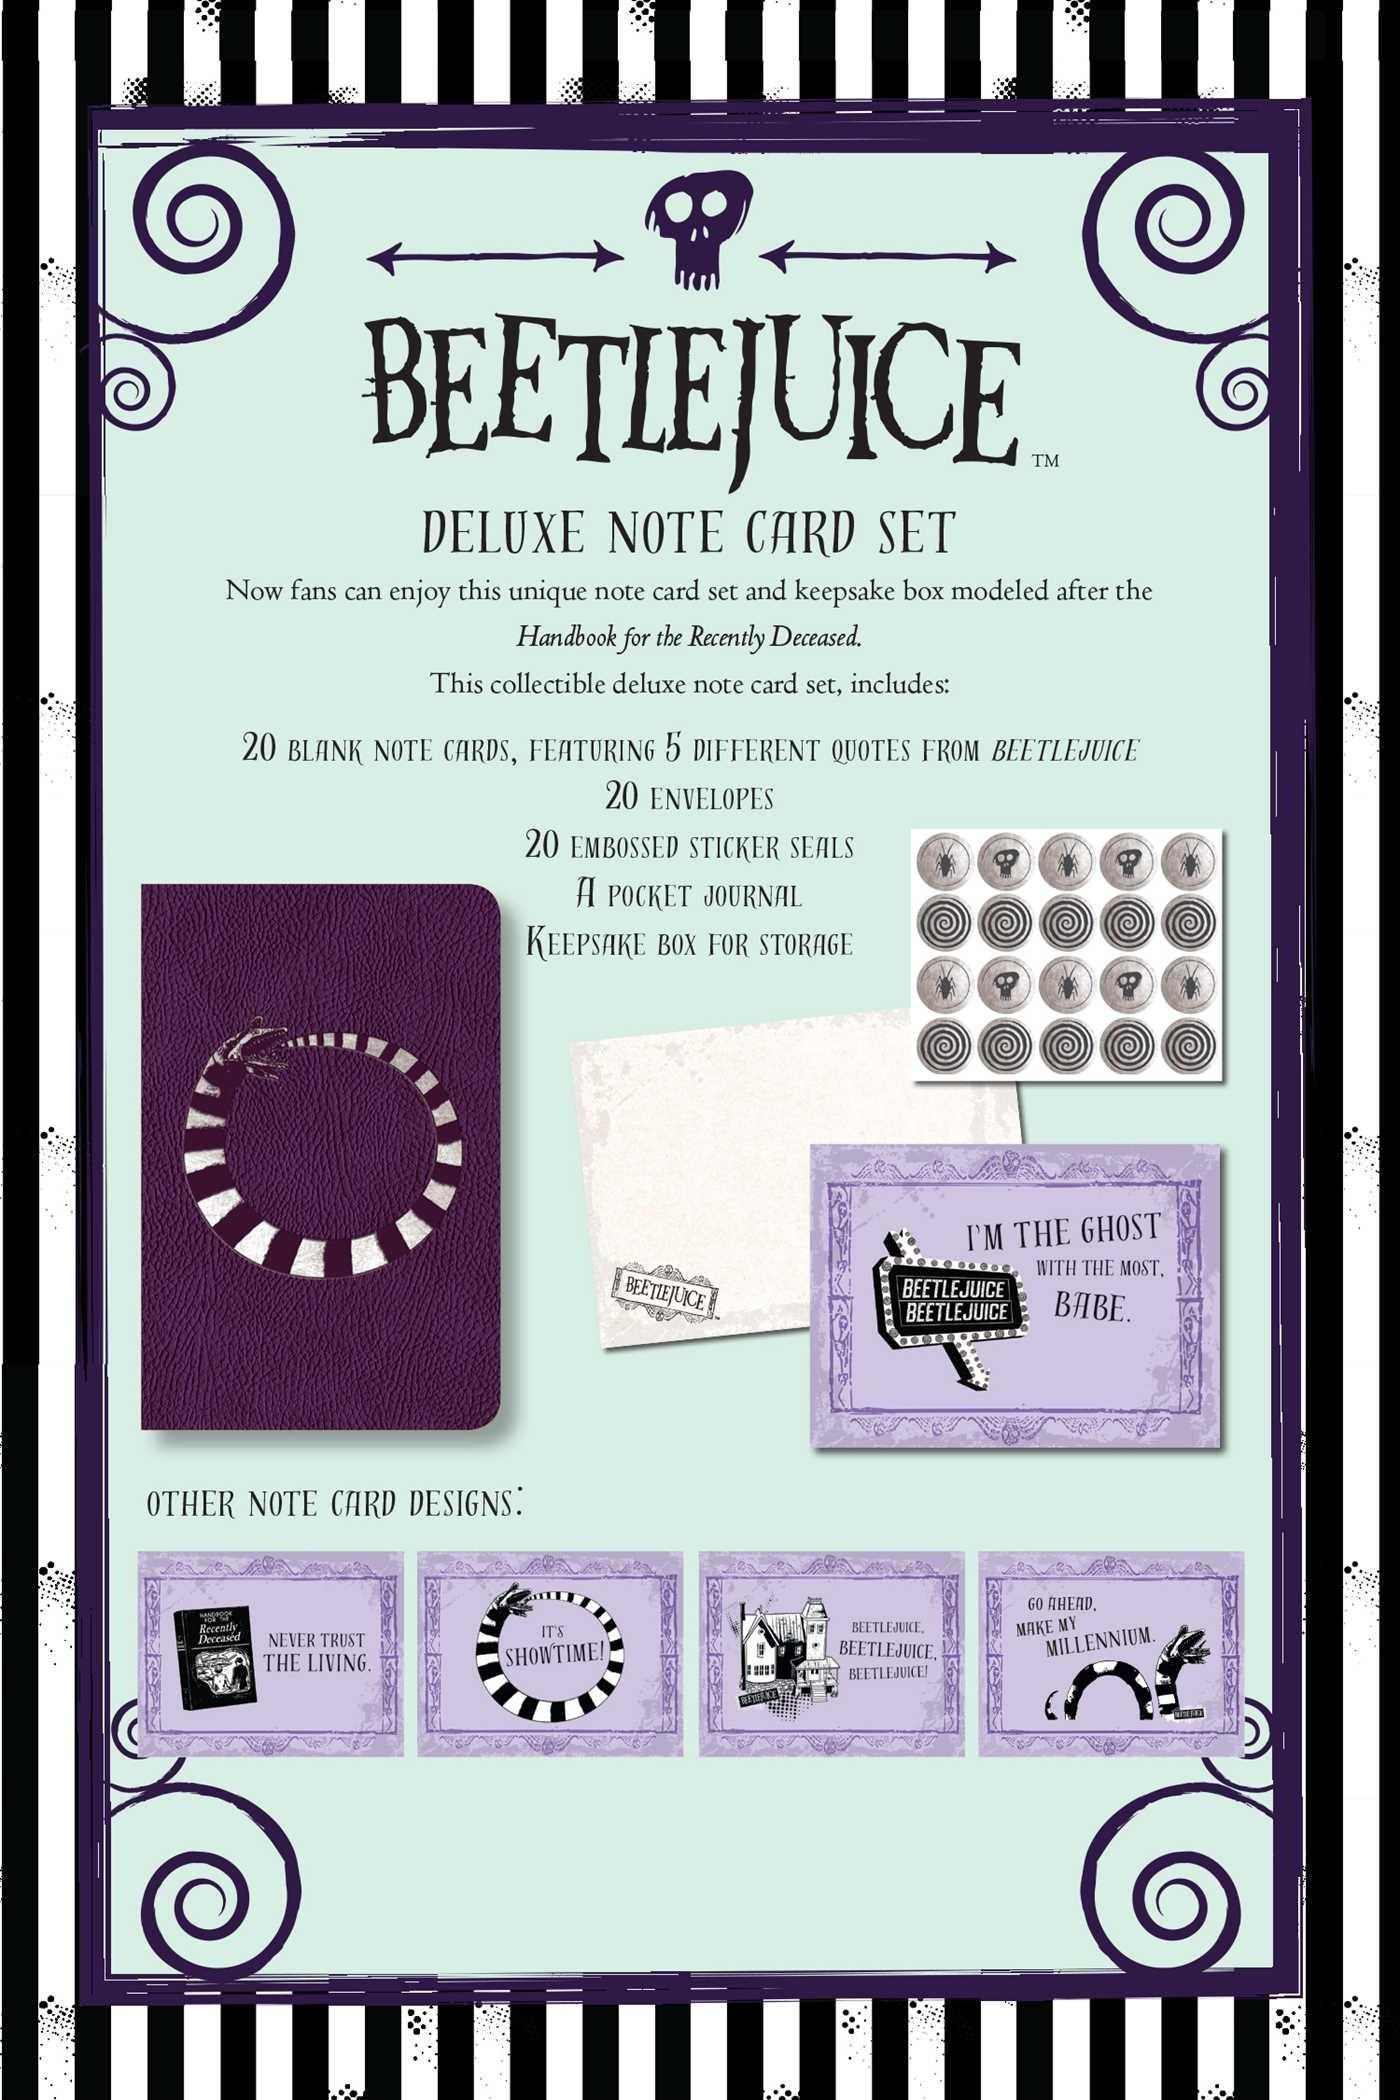 Beetlejuice handbook for the recently deceased deluxe note card set with keepsake book box 9781683833406.in10